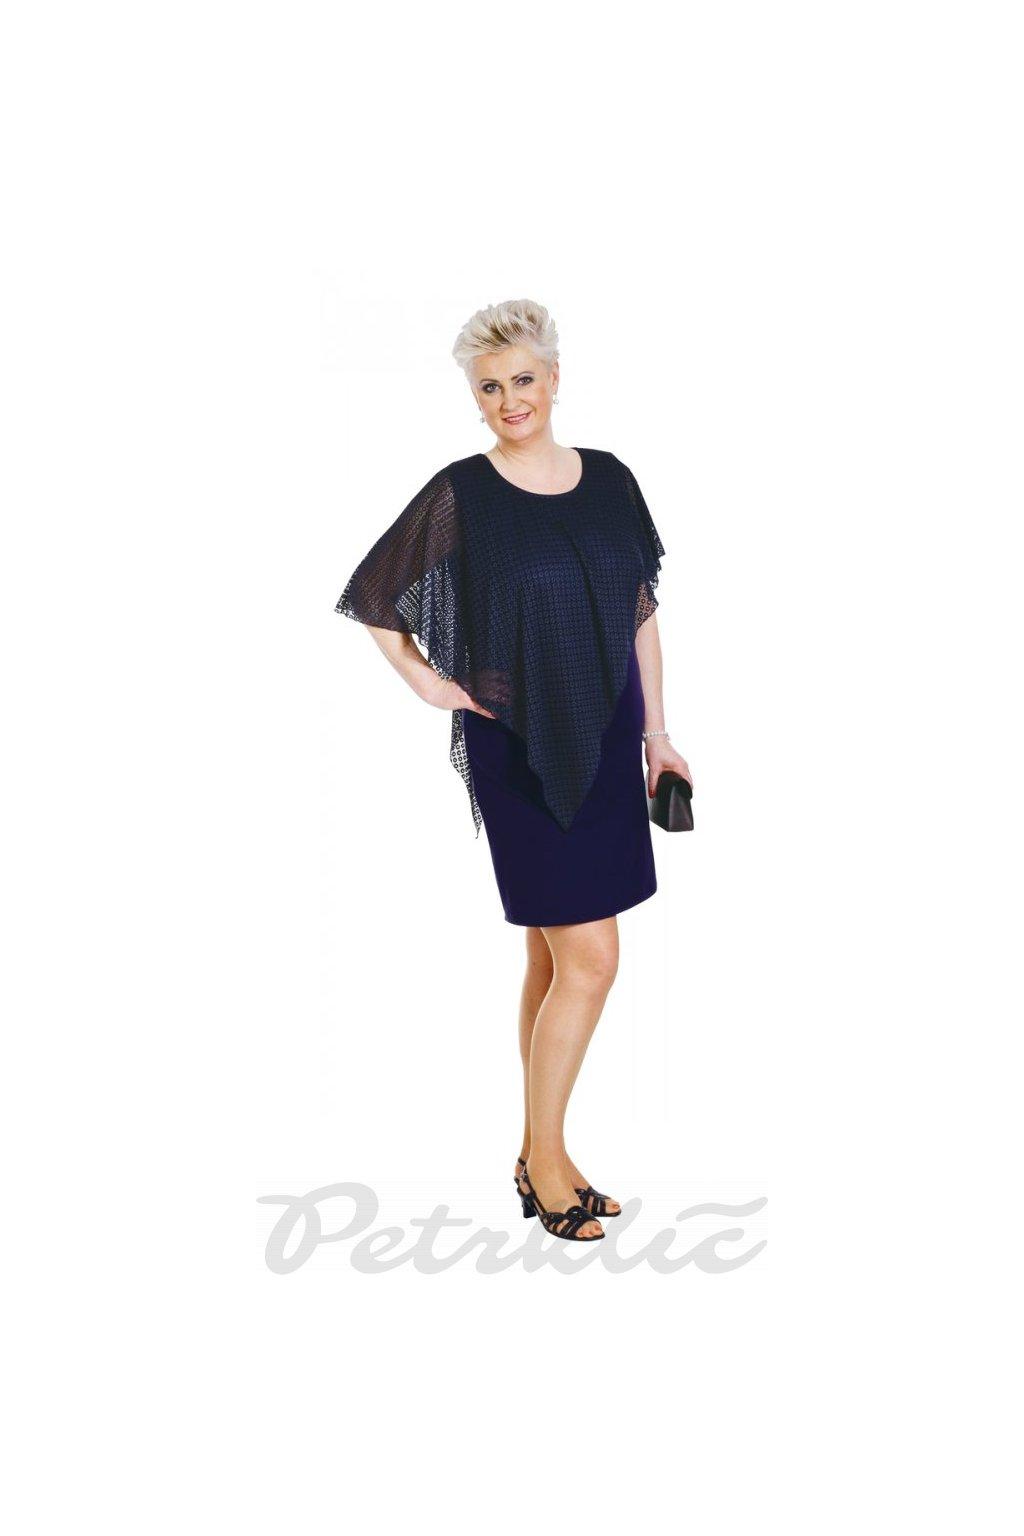 ANNA - šaty s krajkou 95 - 100 cm